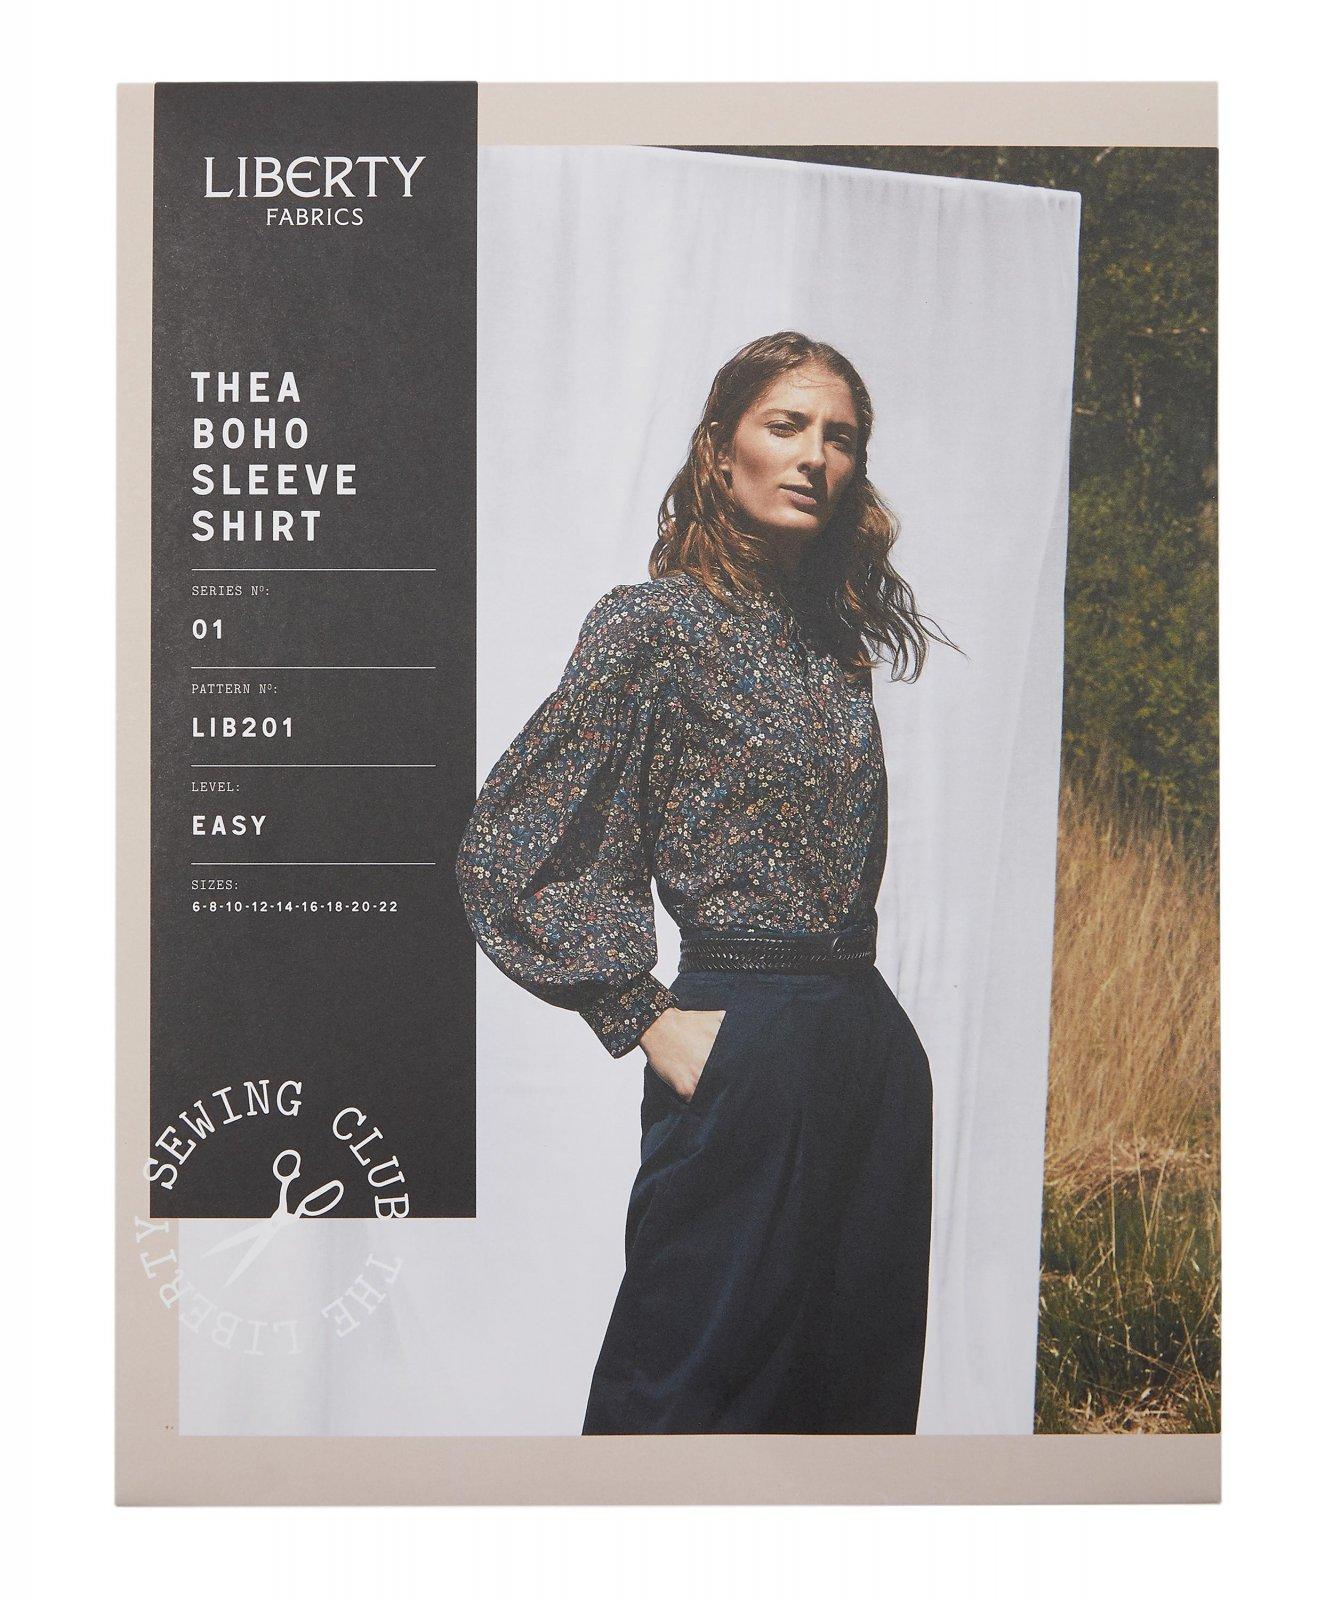 Liberty Fabrics Thea Boho Sleeve Shirt